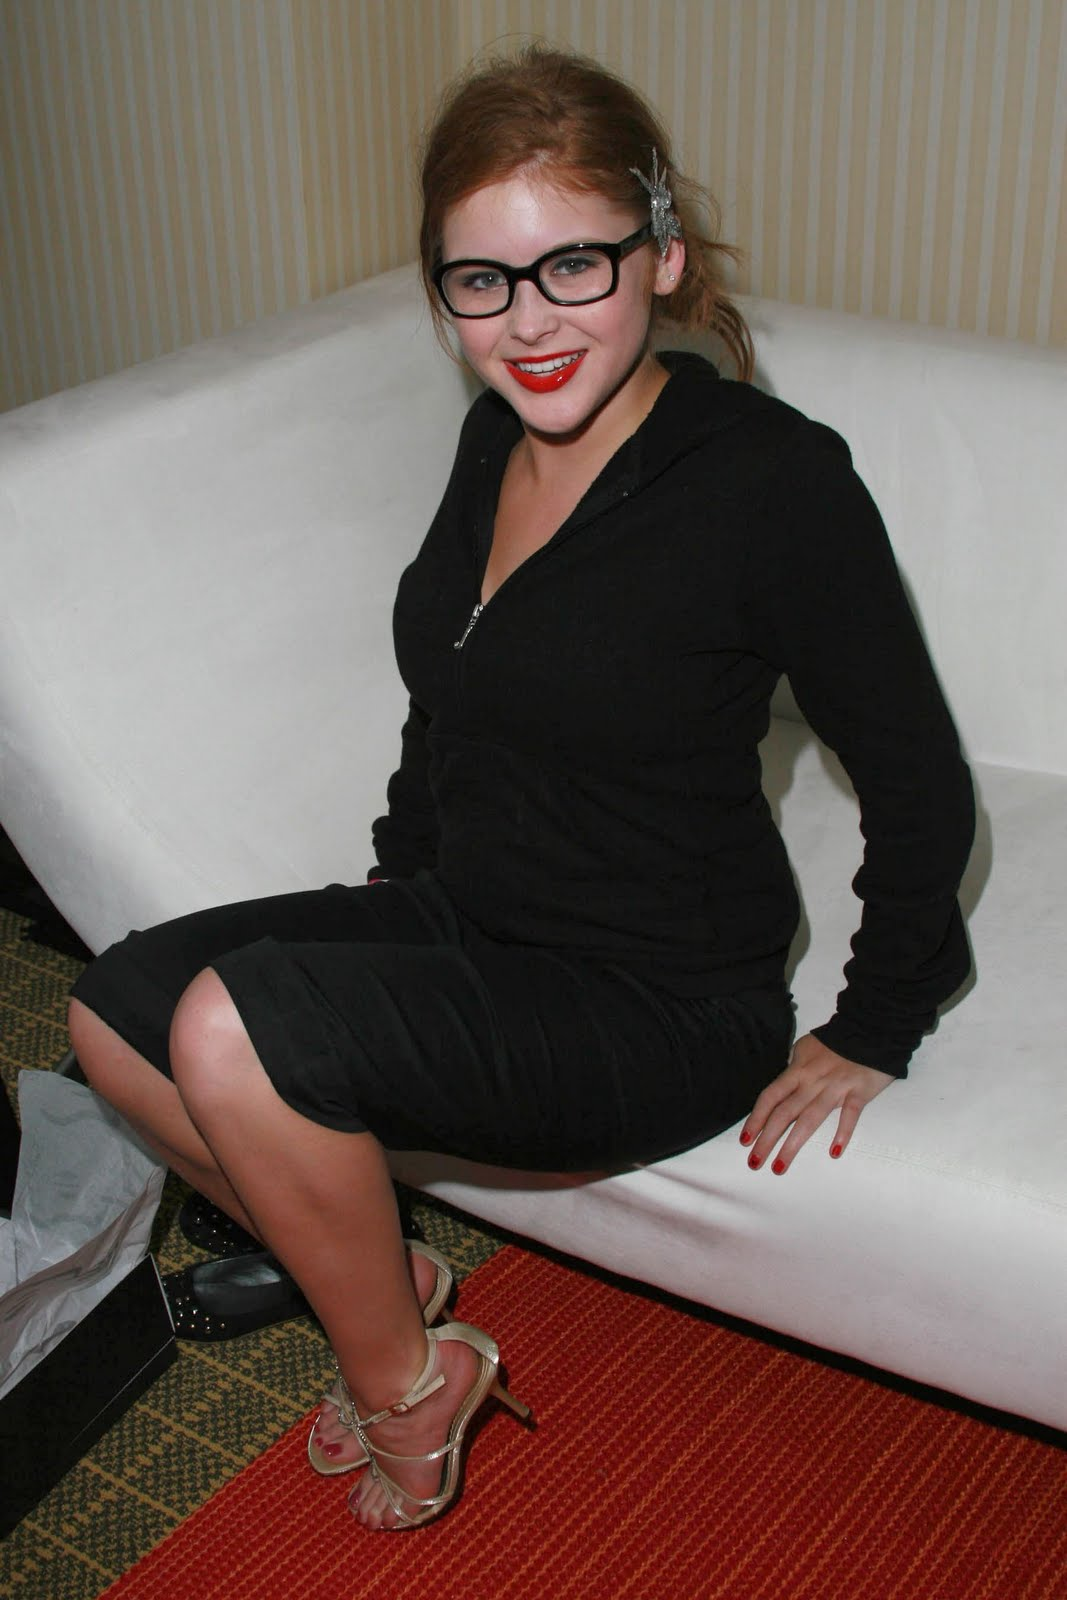 http://2.bp.blogspot.com/_UaLWp72nij4/TC_ATjW6MsI/AAAAAAAAQnk/MNlQ0Mjgawg/s1600/renee-olstead-feet-5.jpg